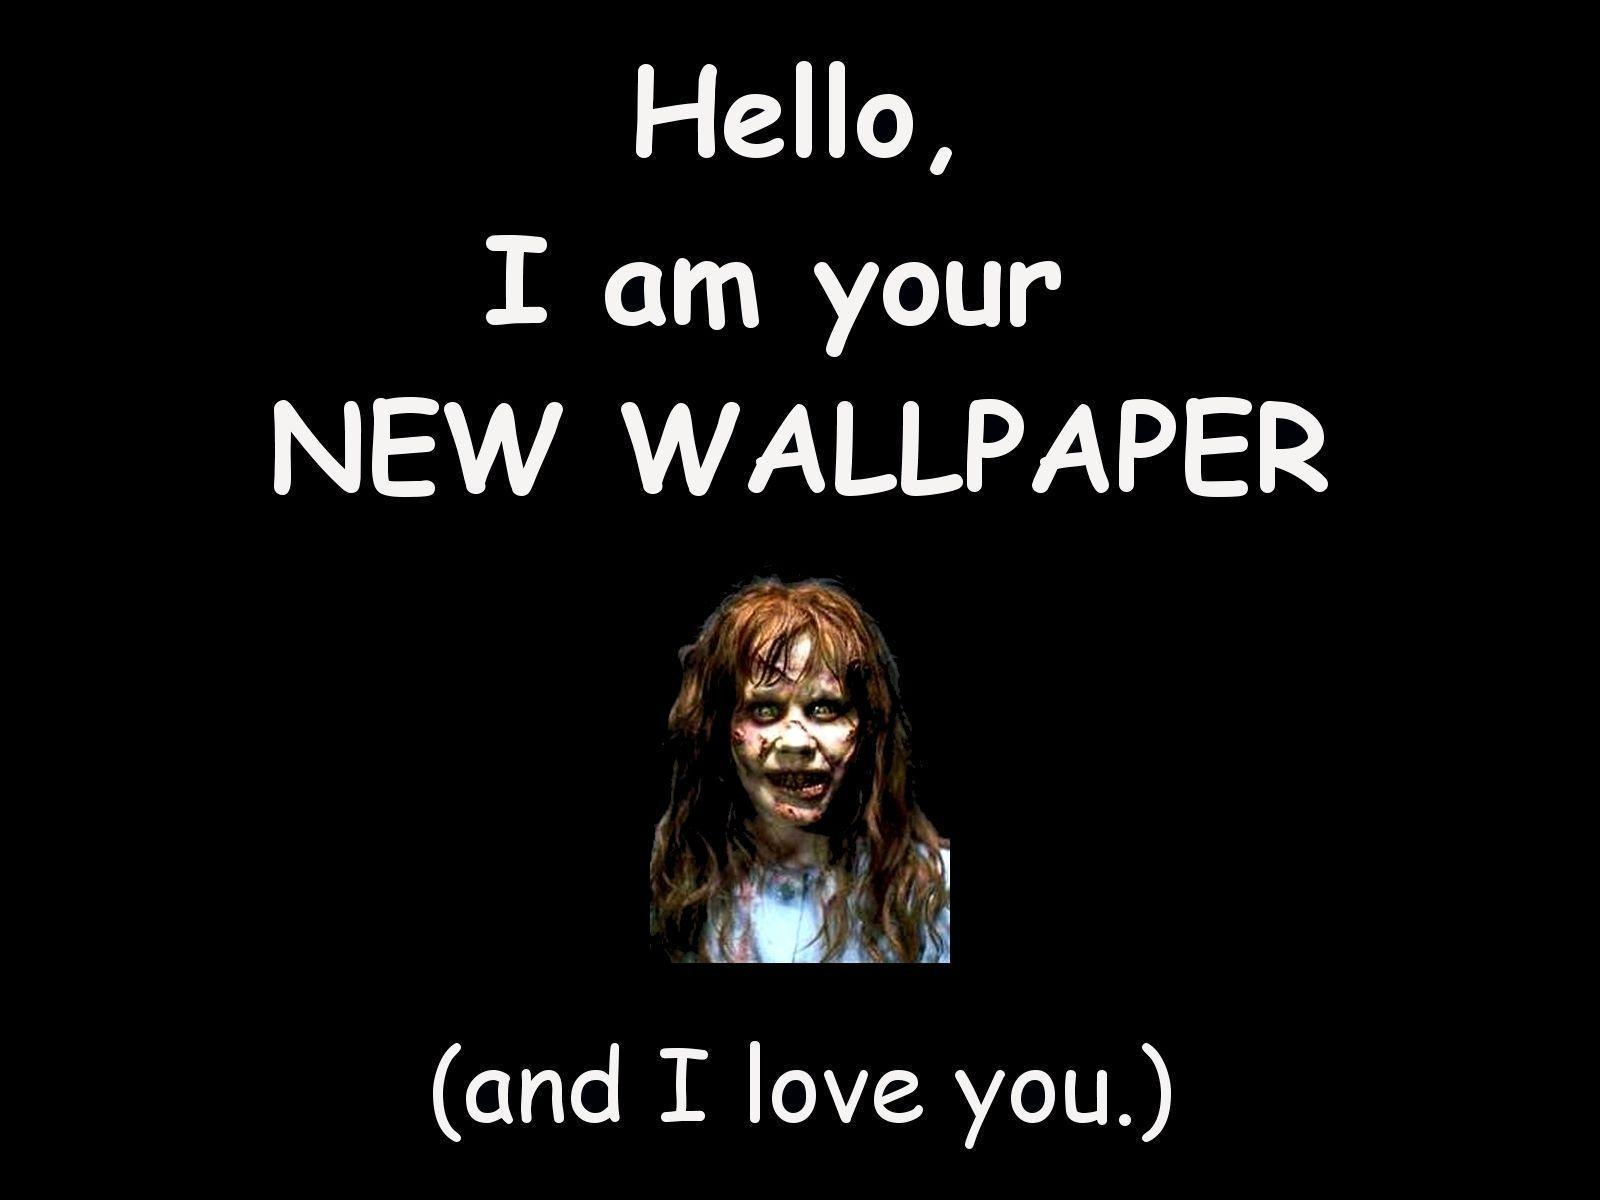 latest funny jokes picture of new wallpaper joke pincaption